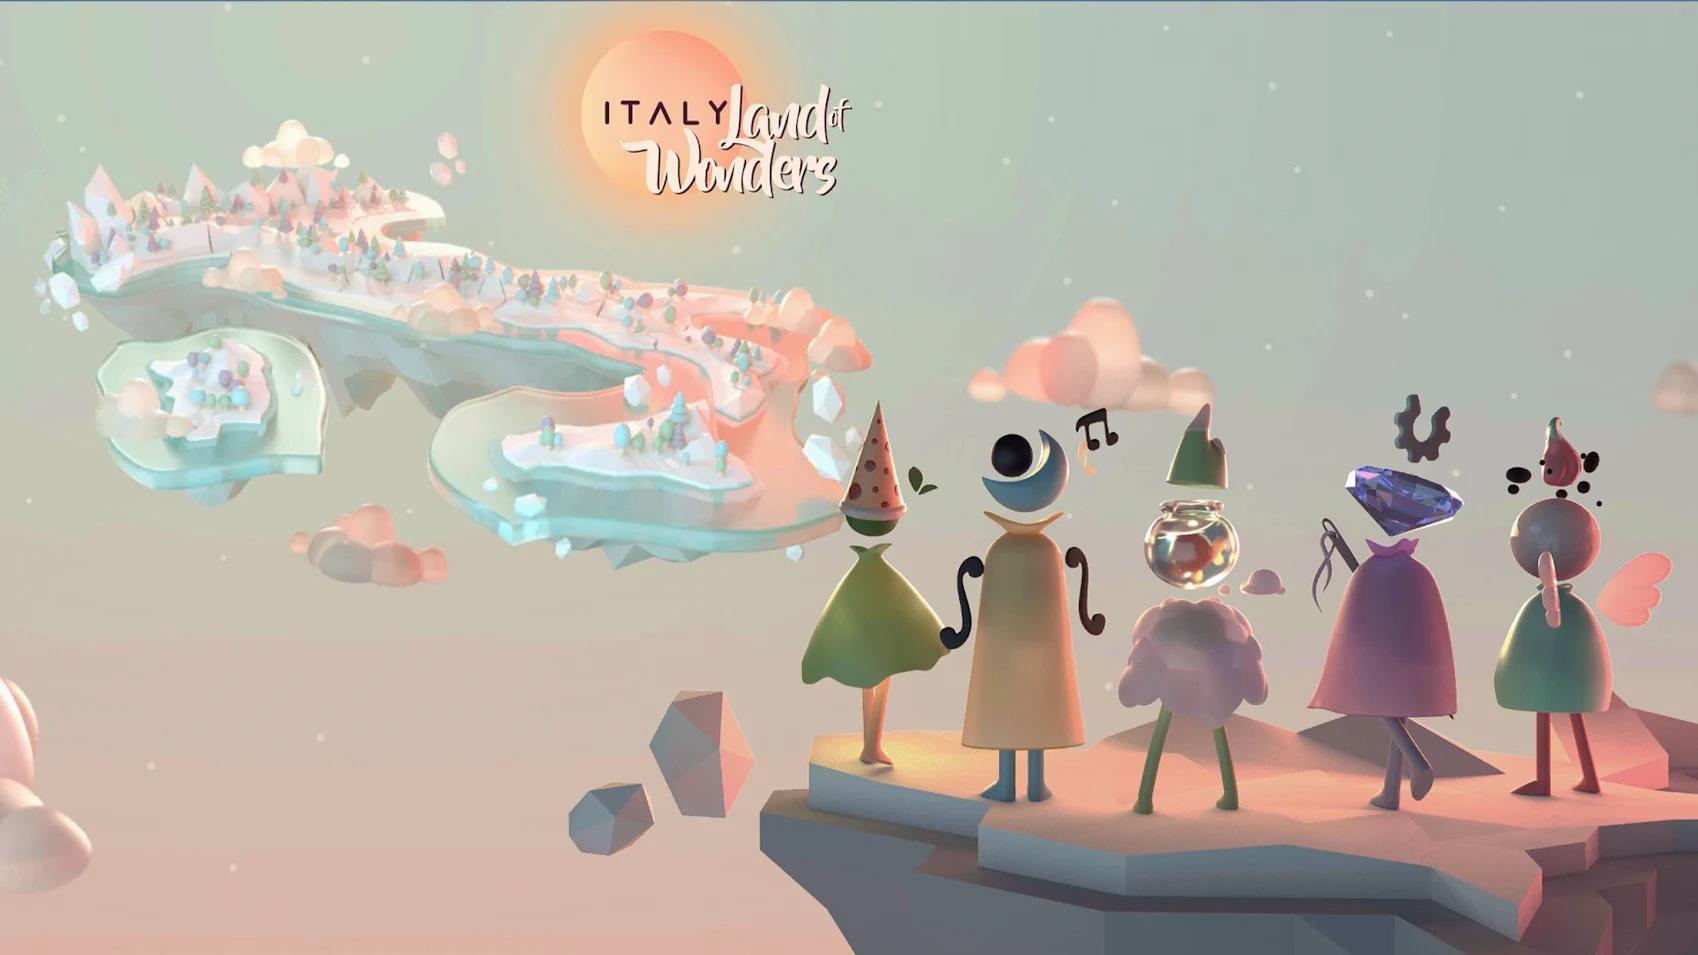 ITALY. Land of Wonders Capa